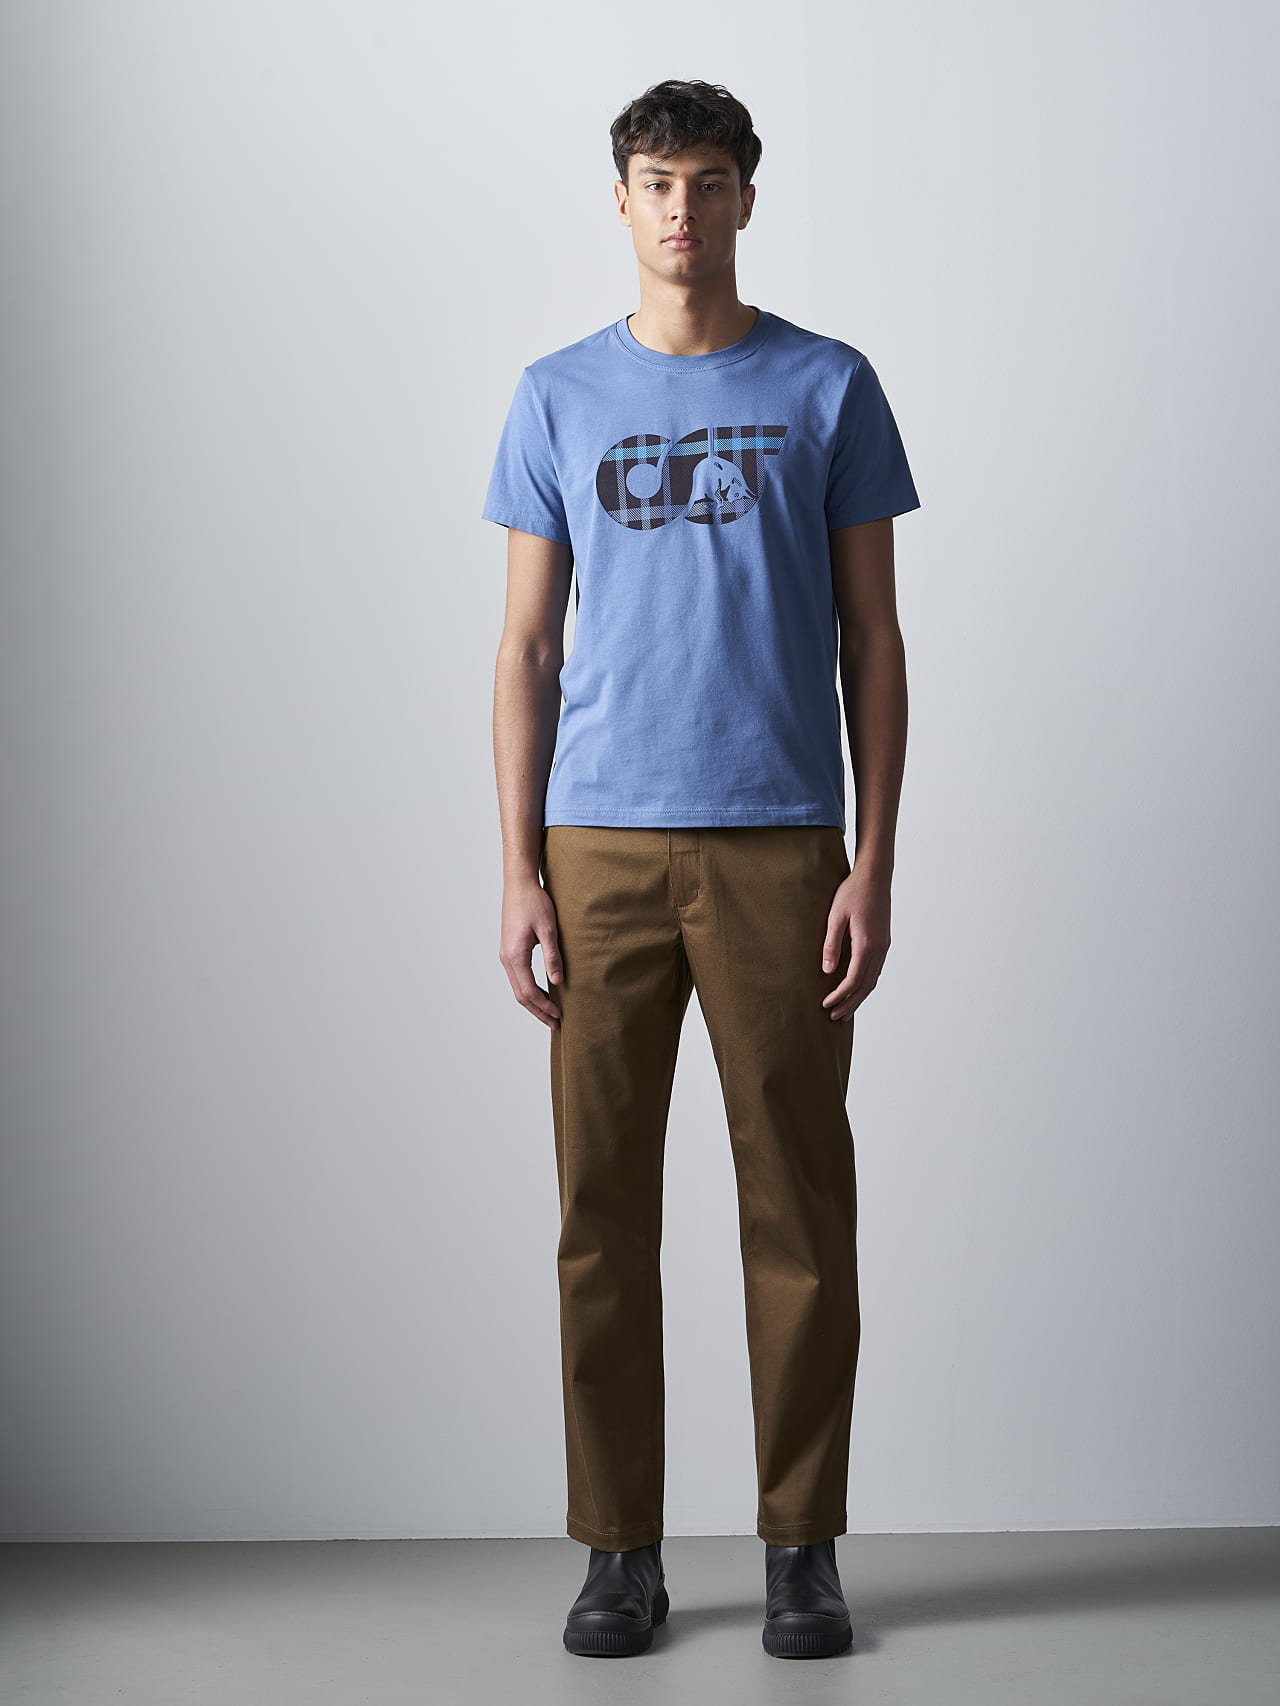 JABIS V1.Y5.02 Logo Print T-Shirt light blue Front Alpha Tauri